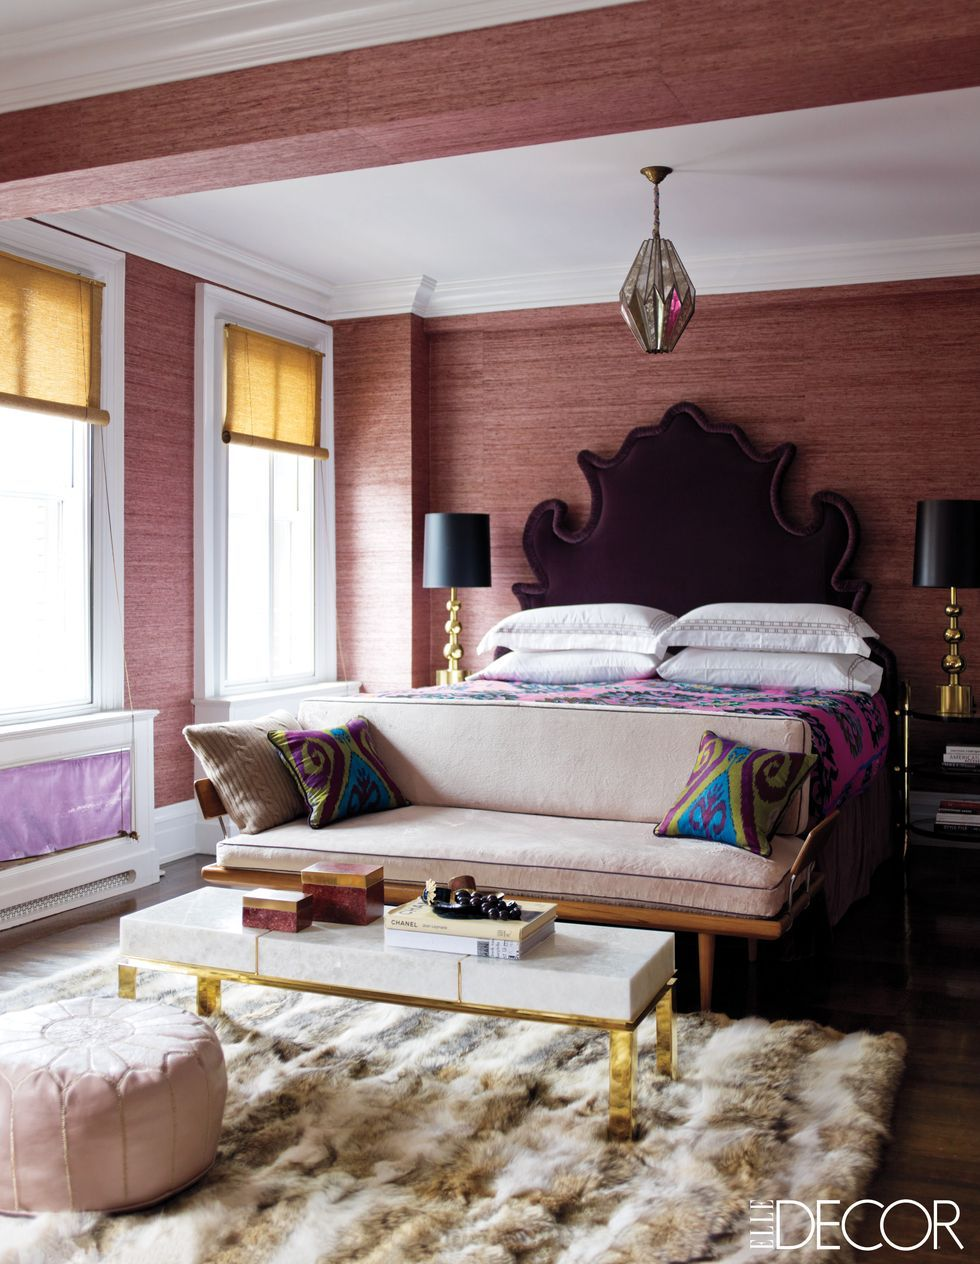 How To Make Your Bedroom Look Expensive Luxury Bedroom Ideas